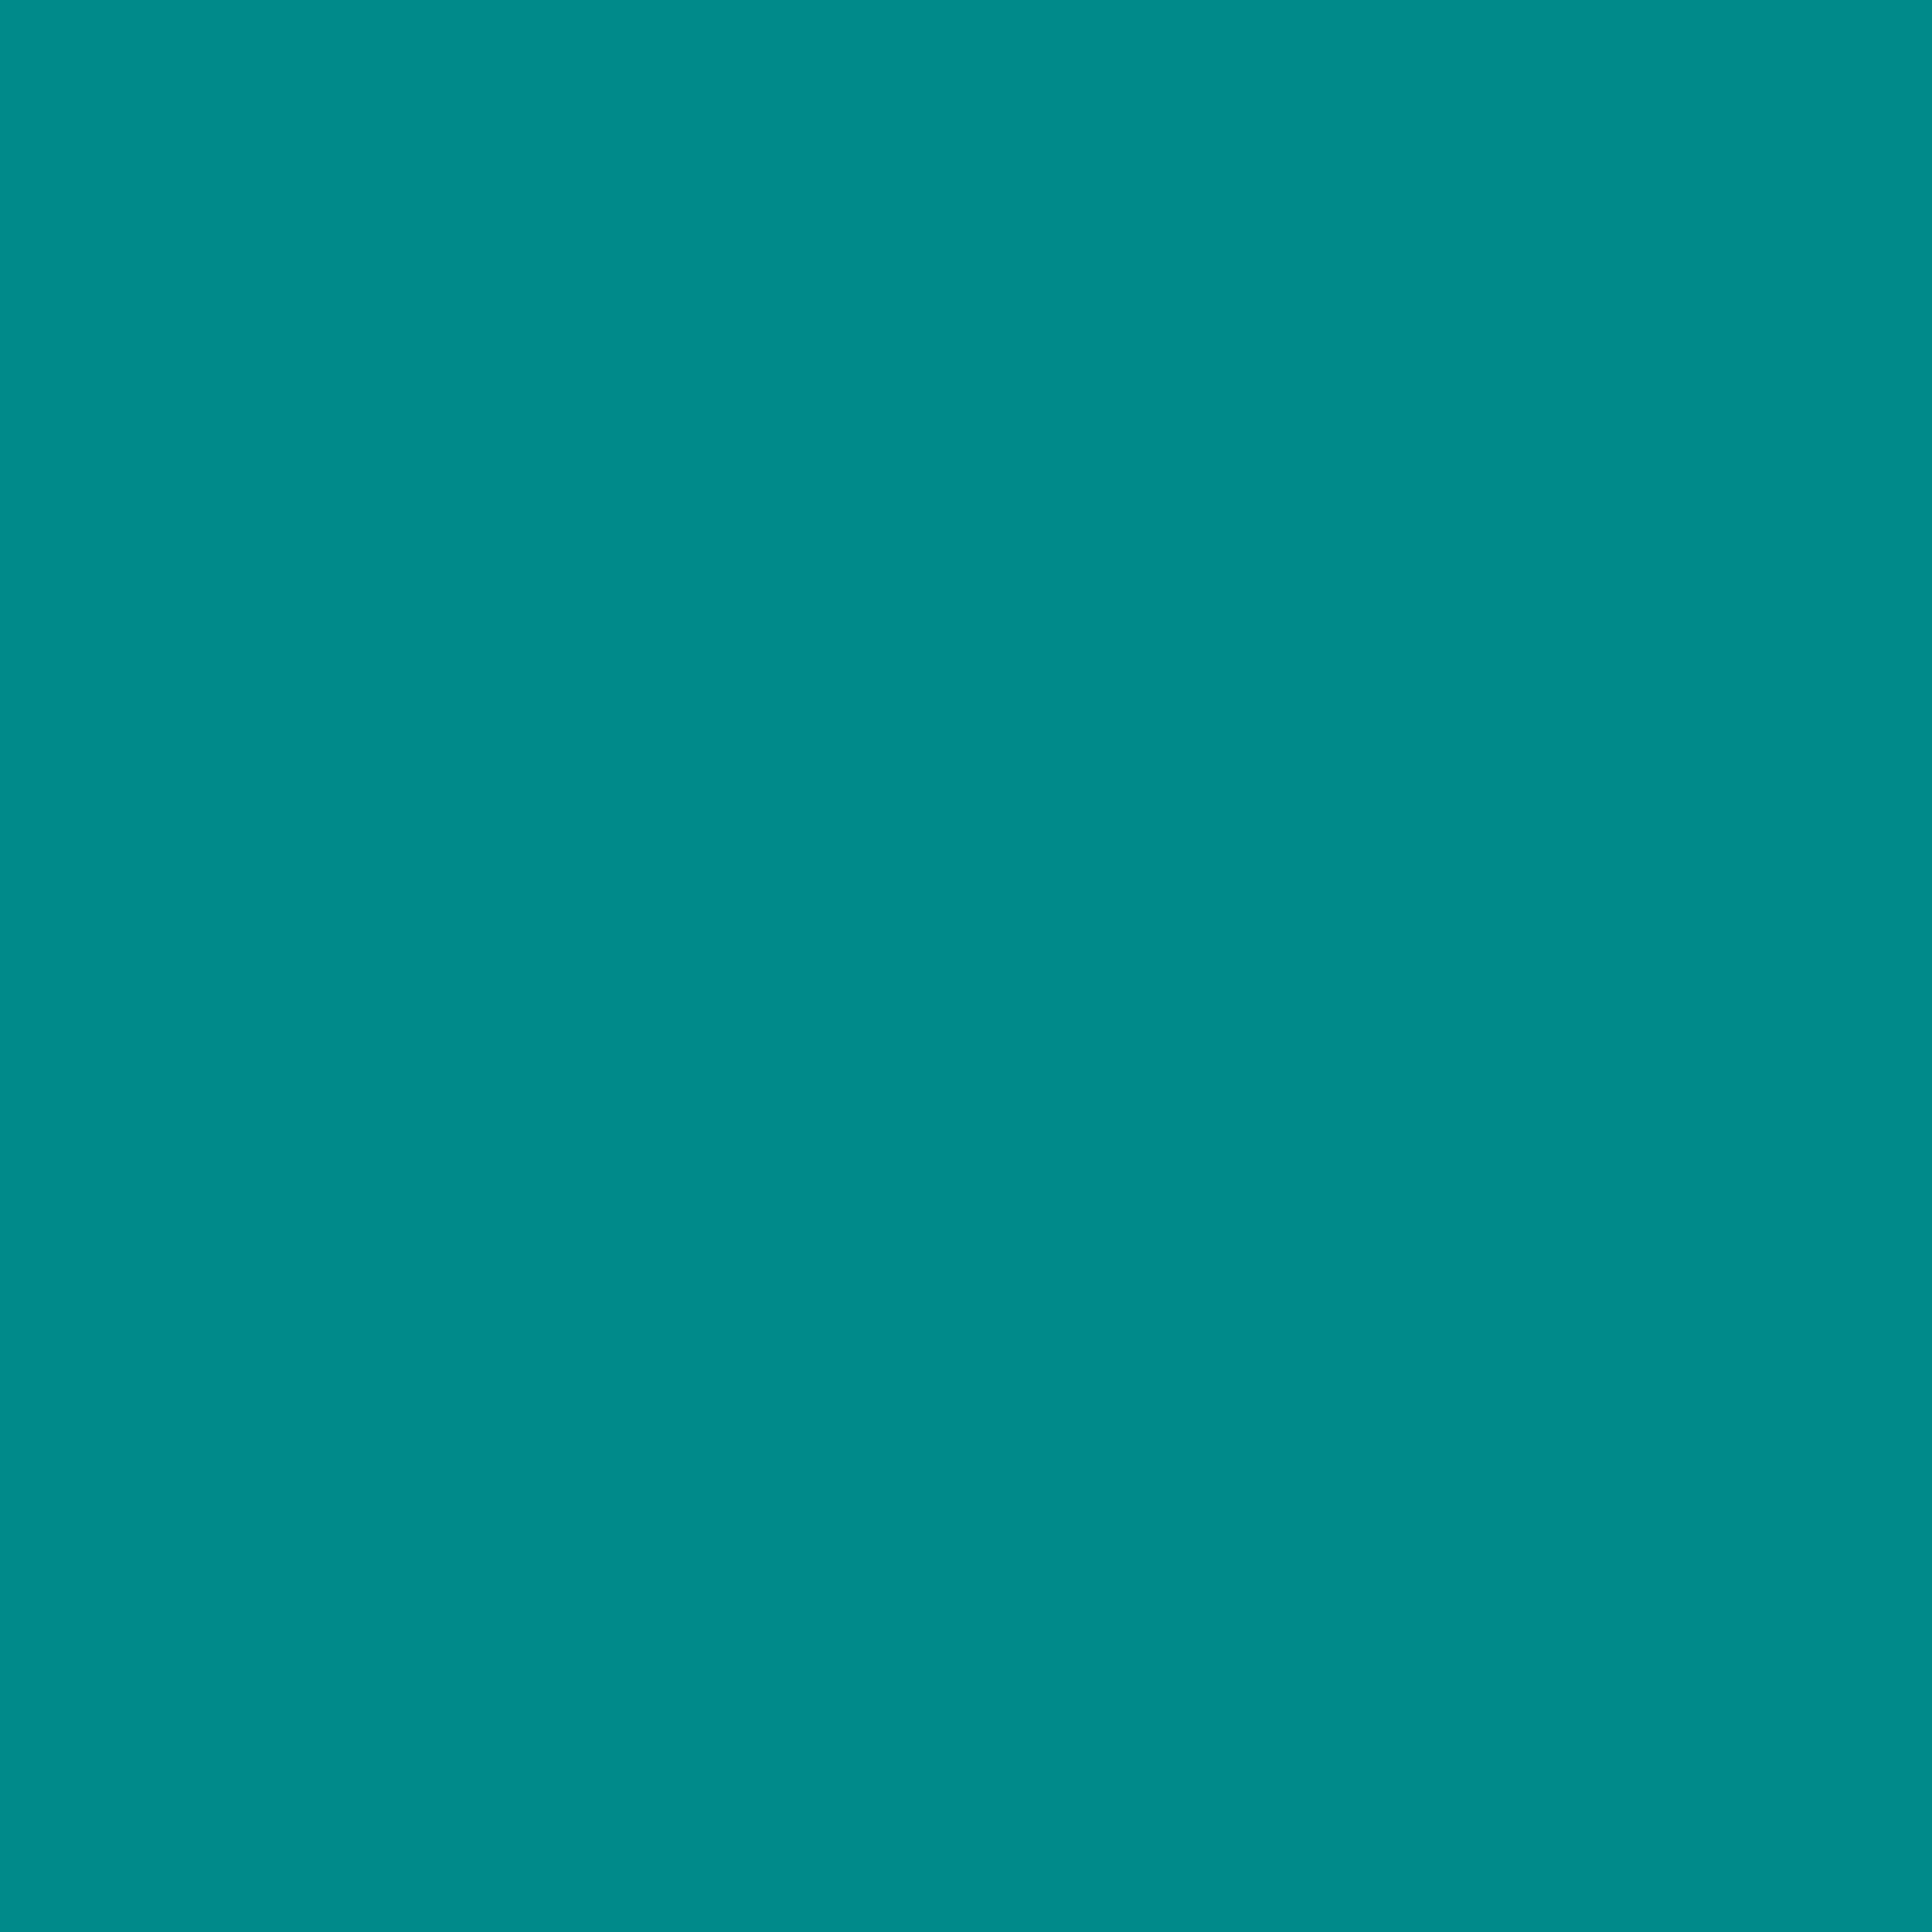 2732x2732 Dark Cyan Solid Color Background